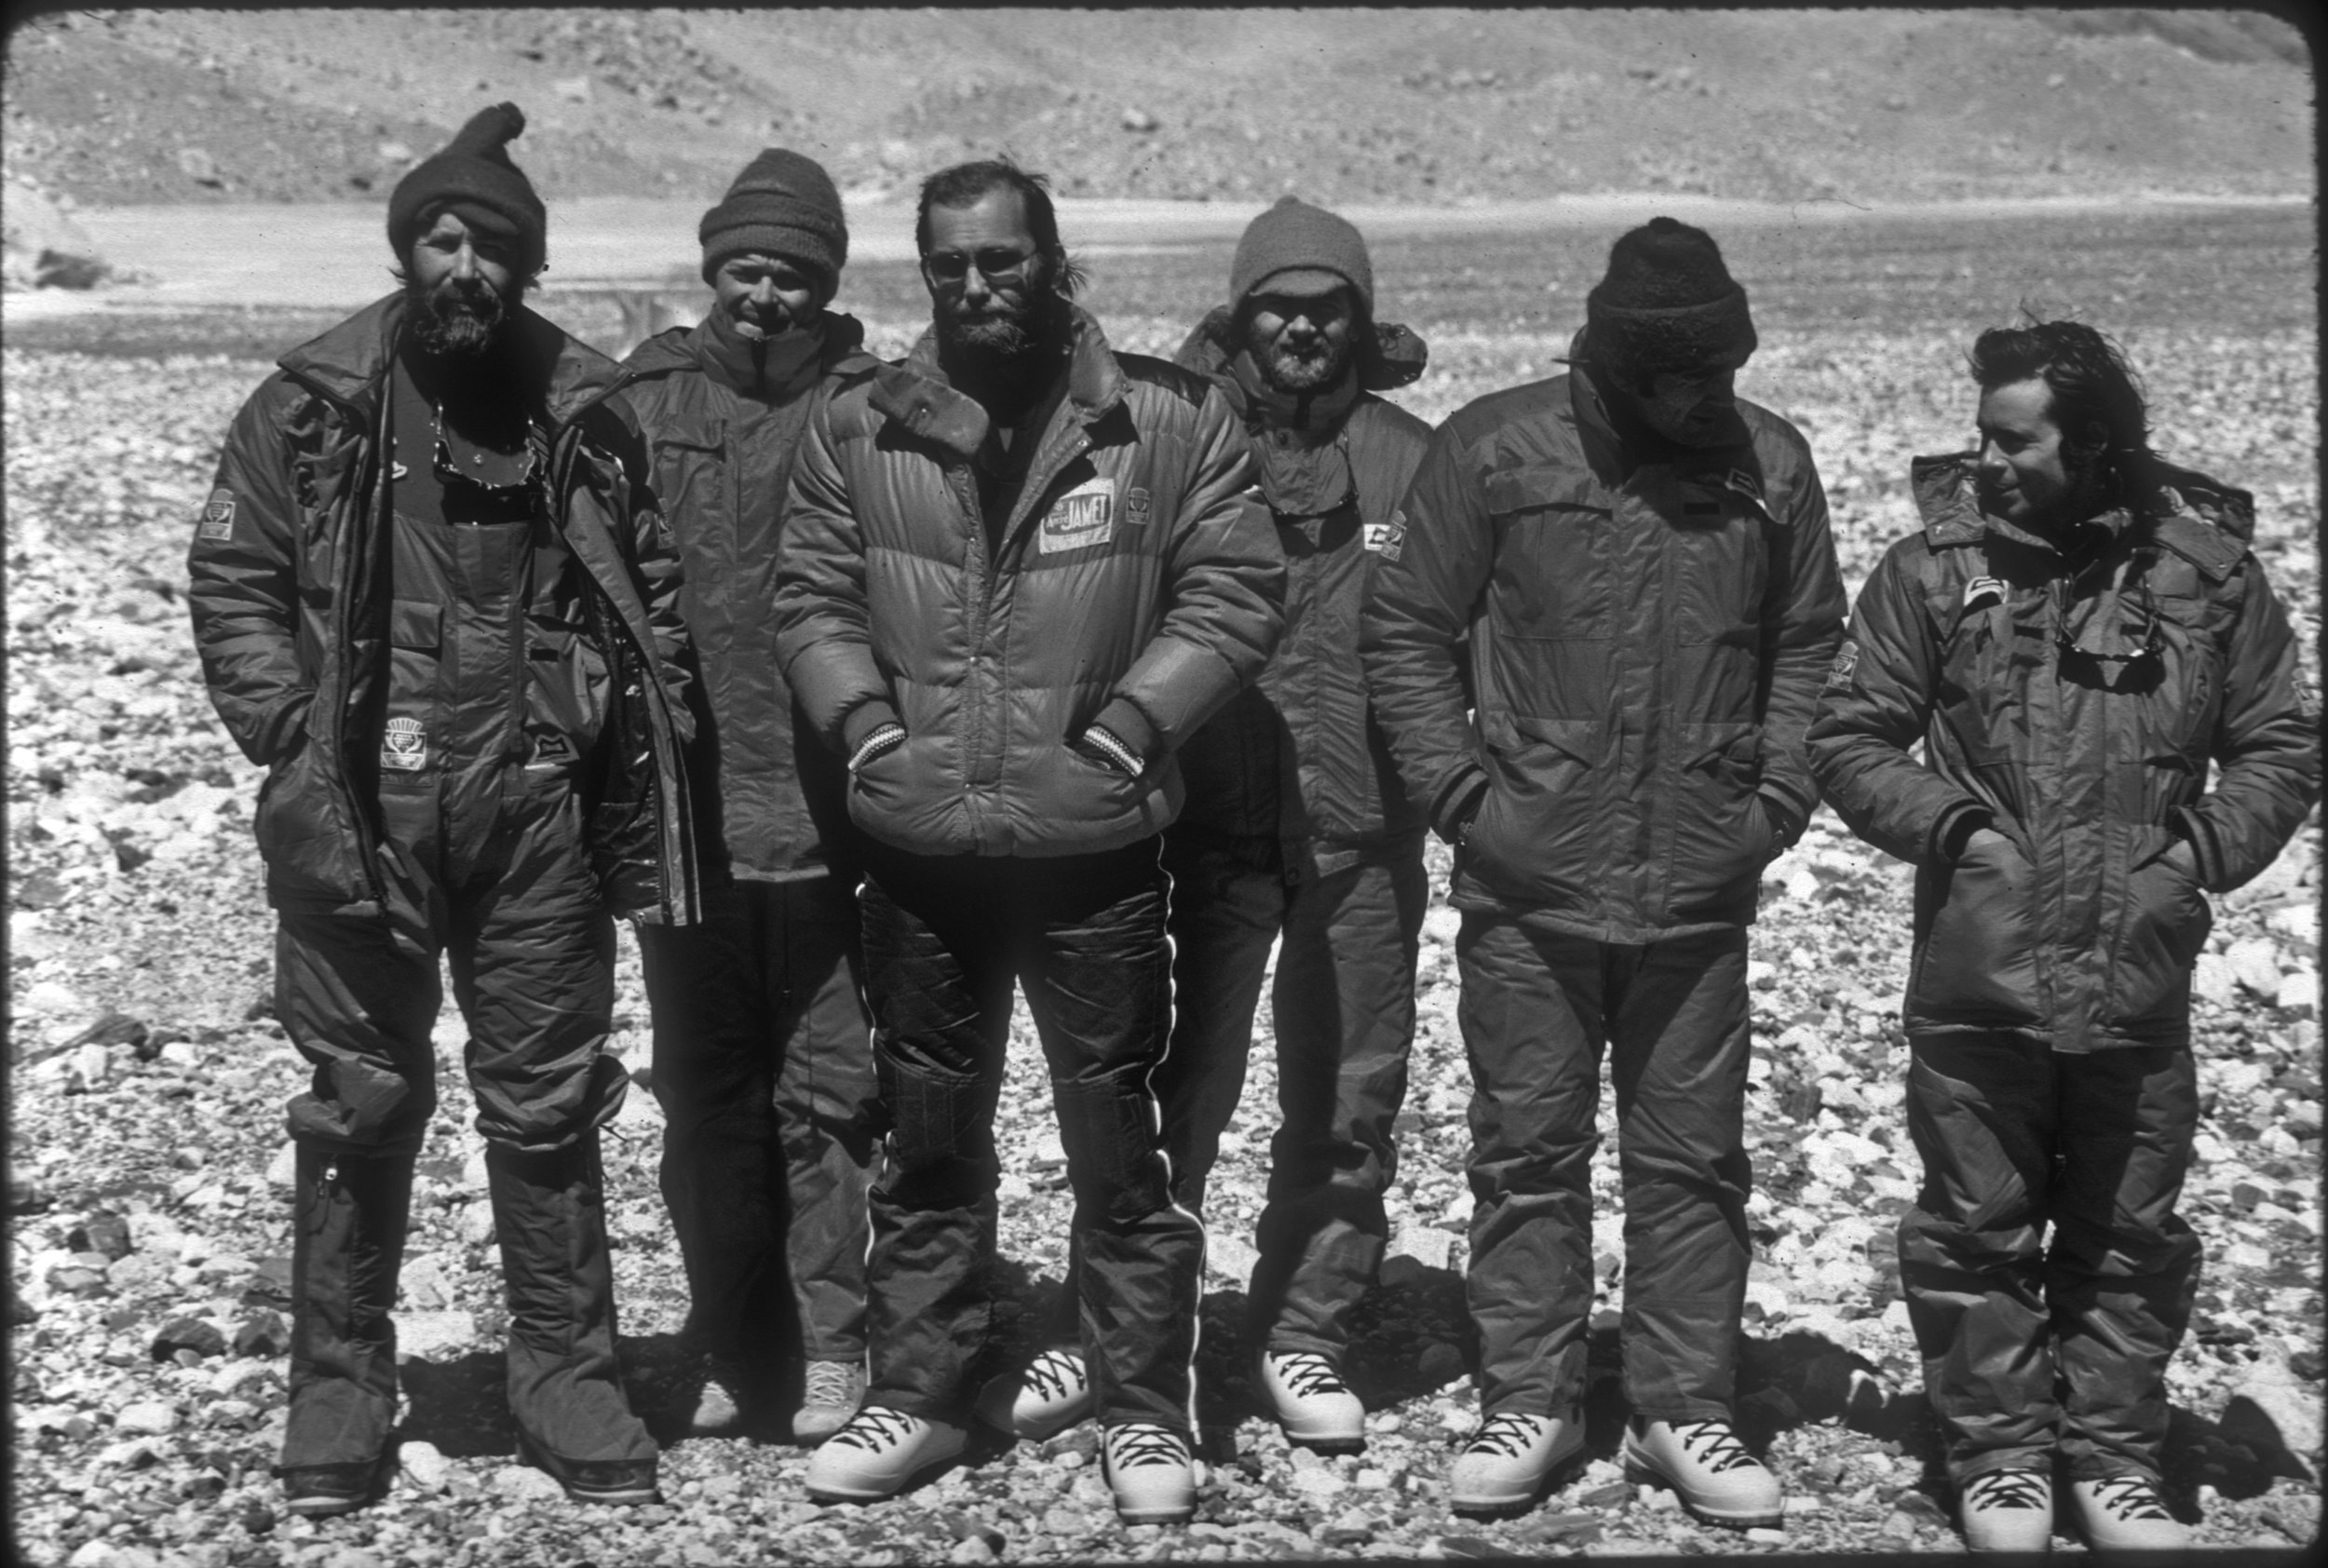 Everest Northeast Ridge Expedition, 1982